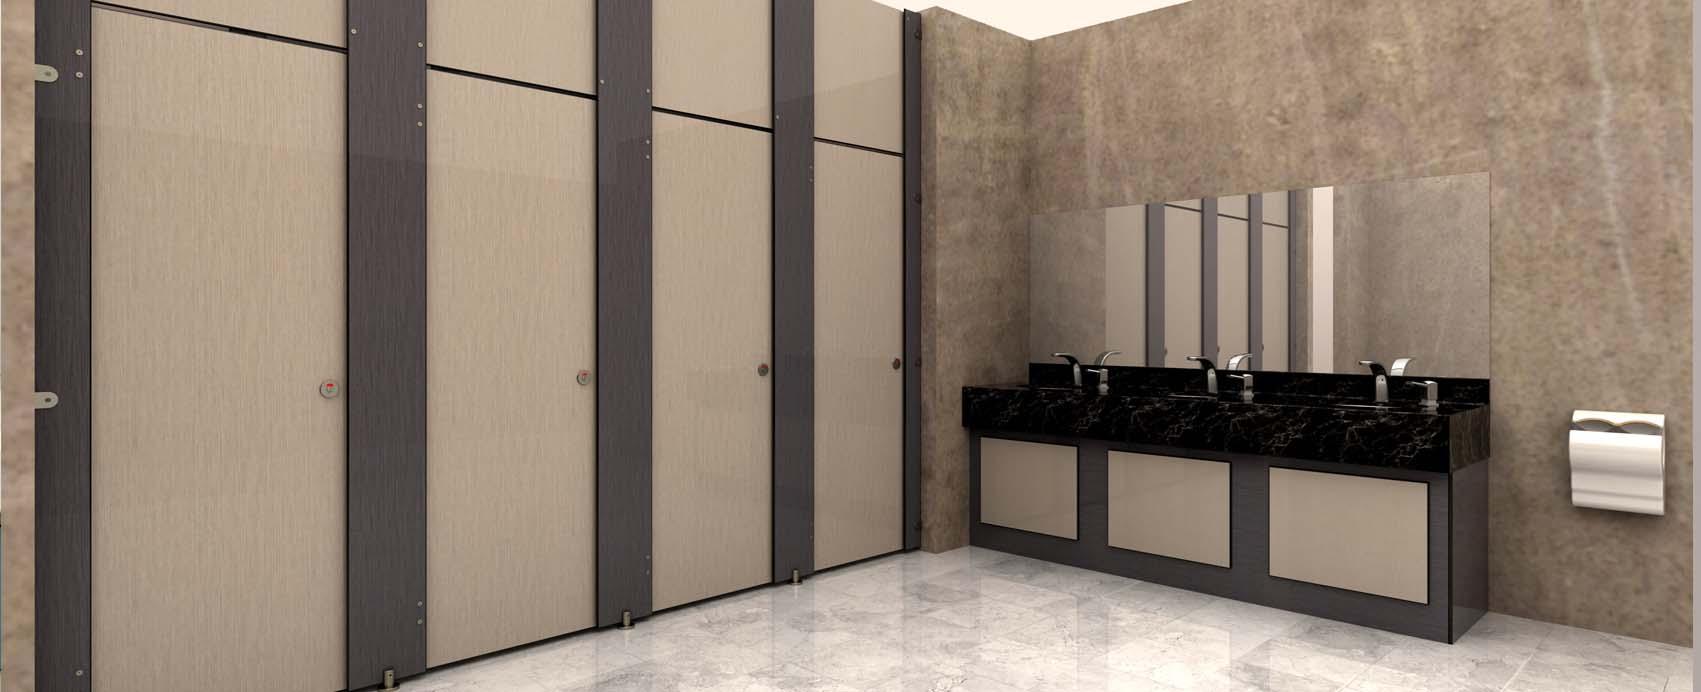 metal partition